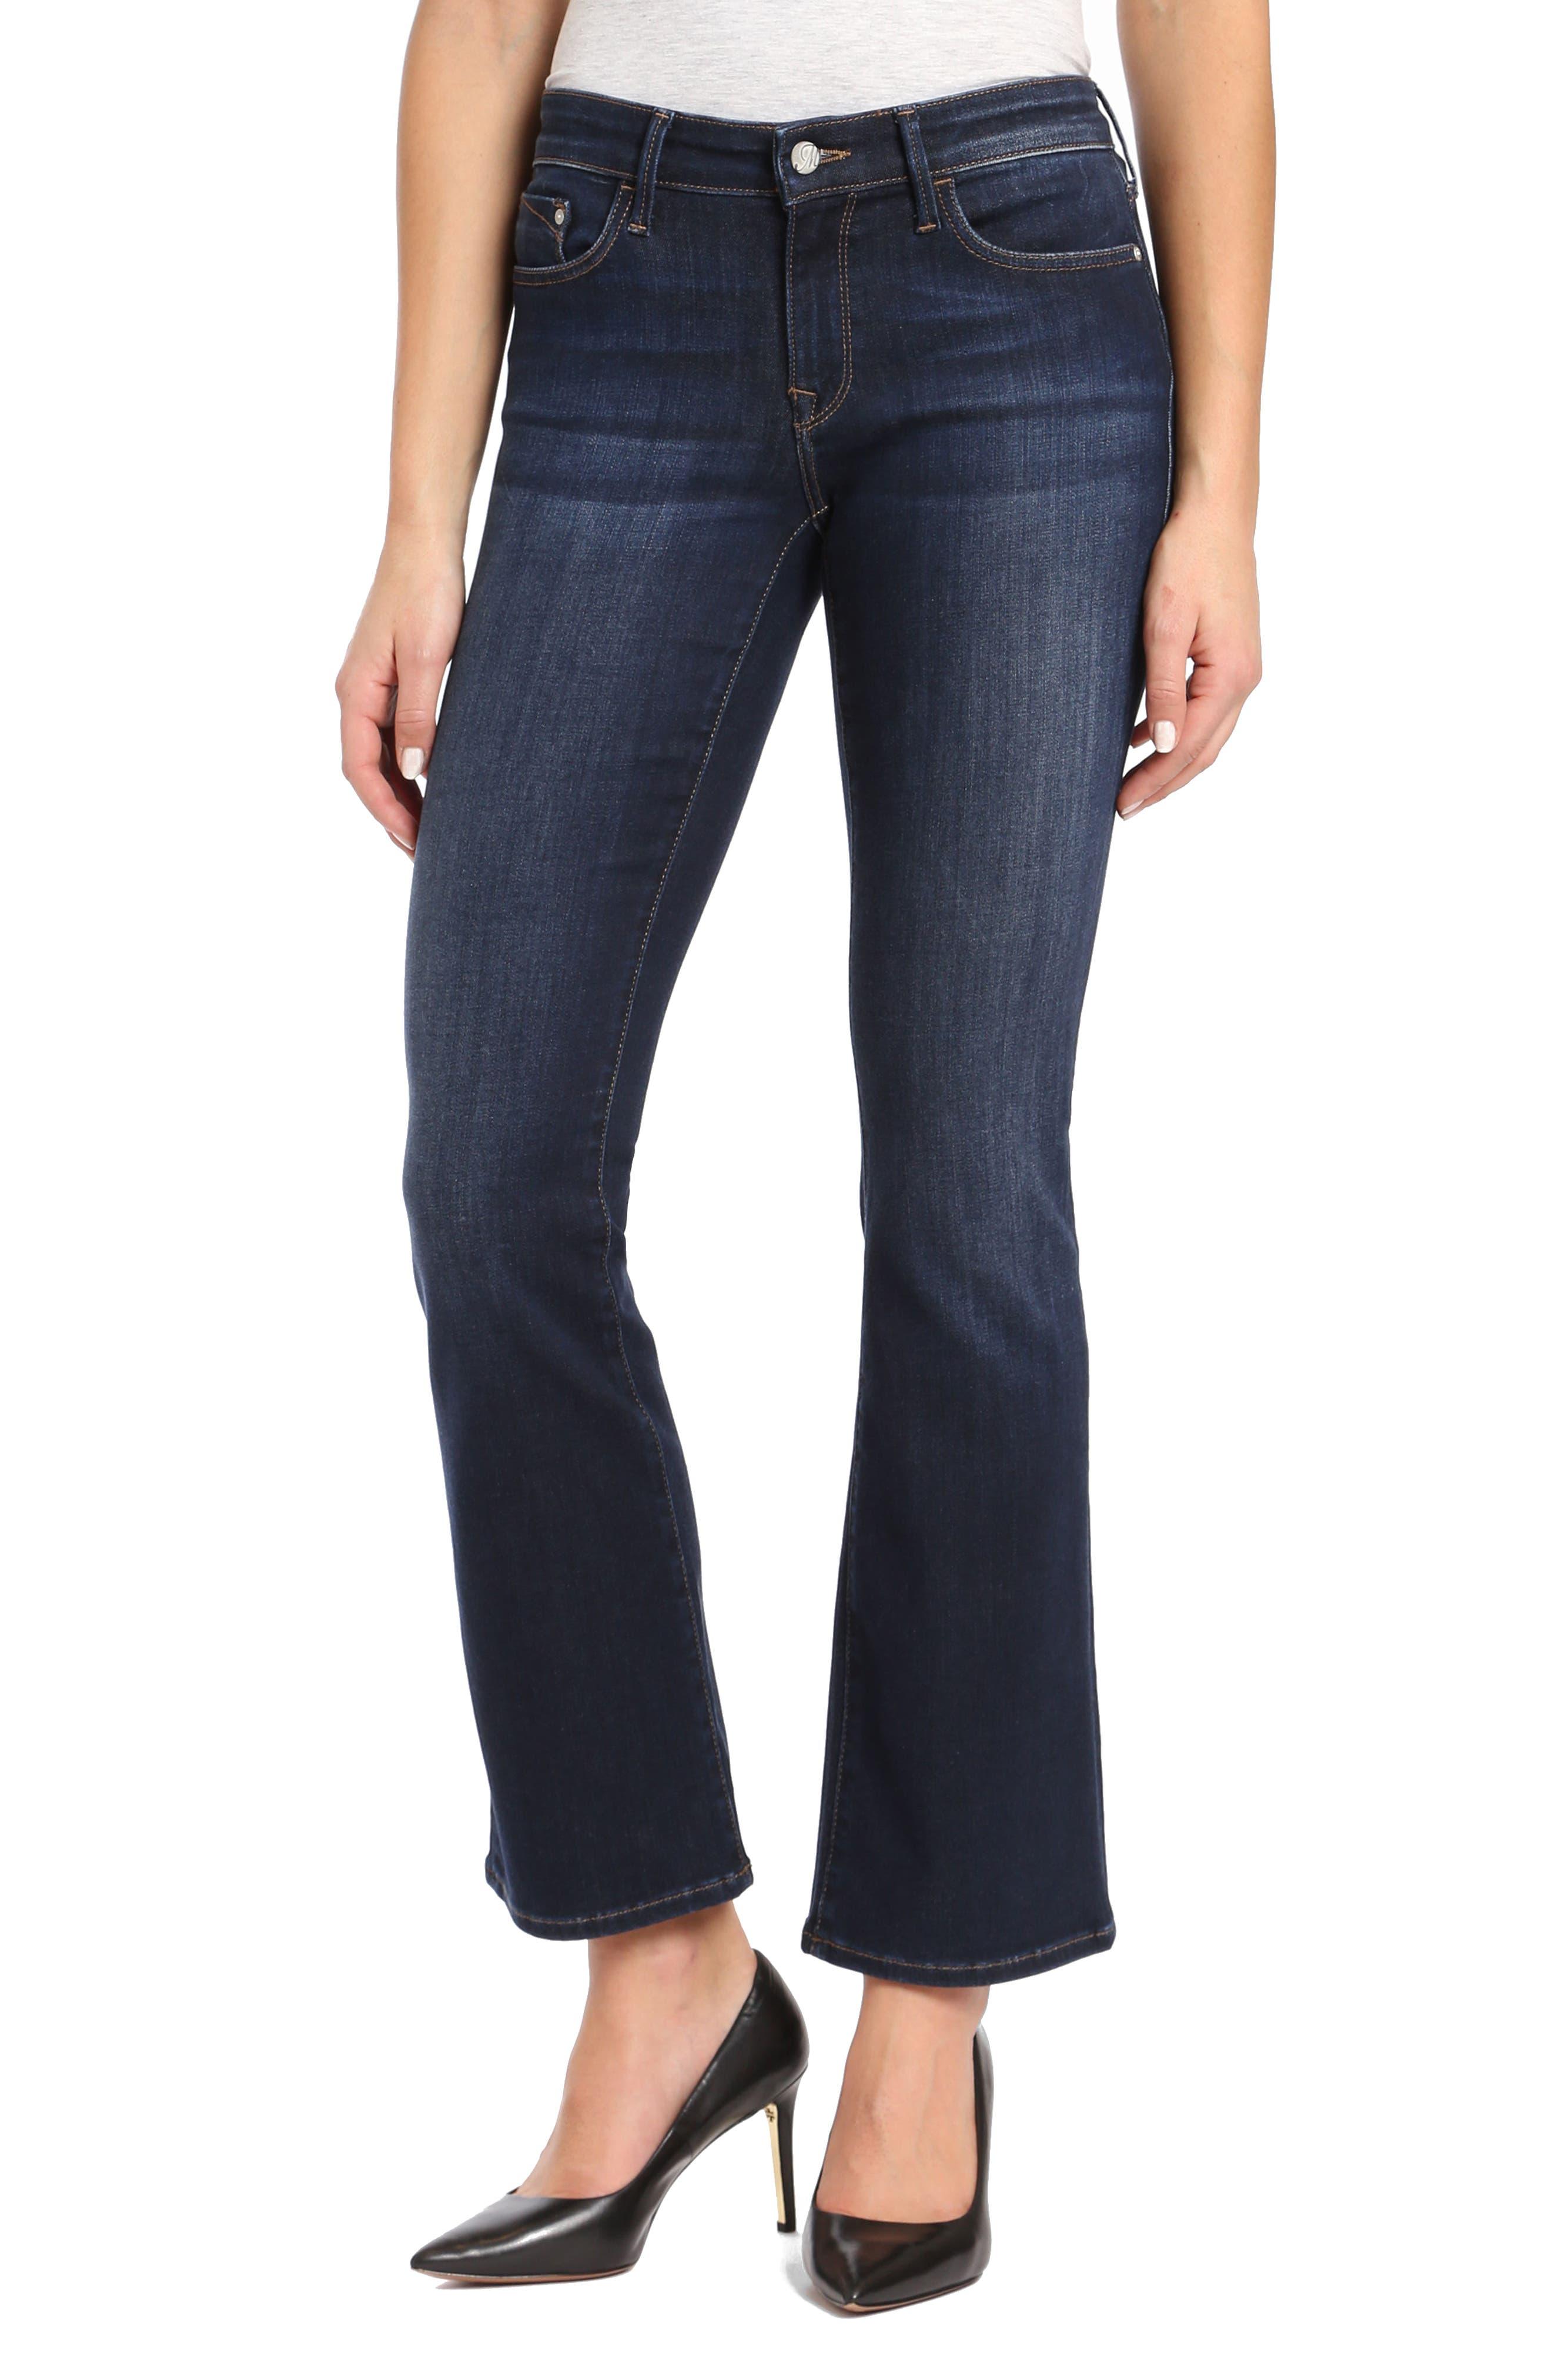 Women's Mavi Jeans Molly Classic Bootcuts Jeans